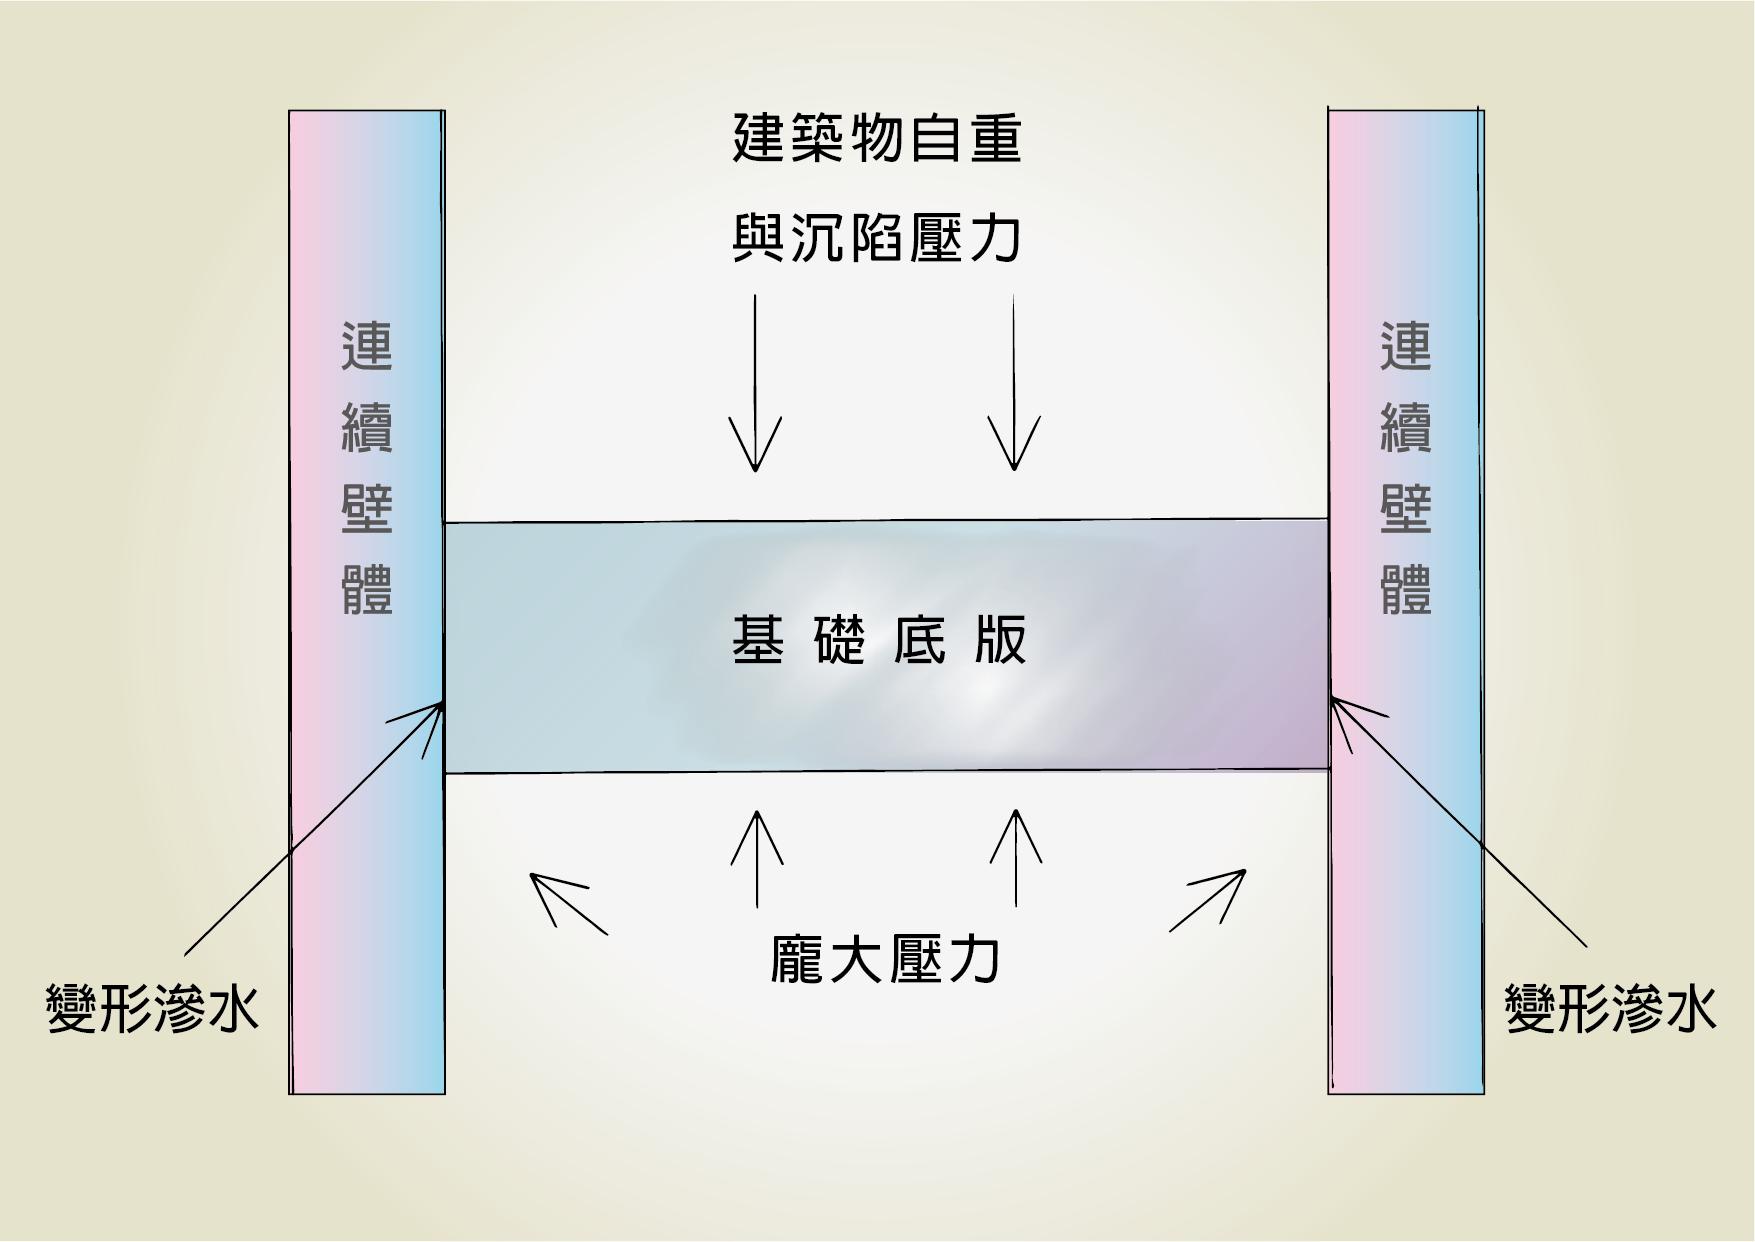 圖2-4-79(重點解析2).png